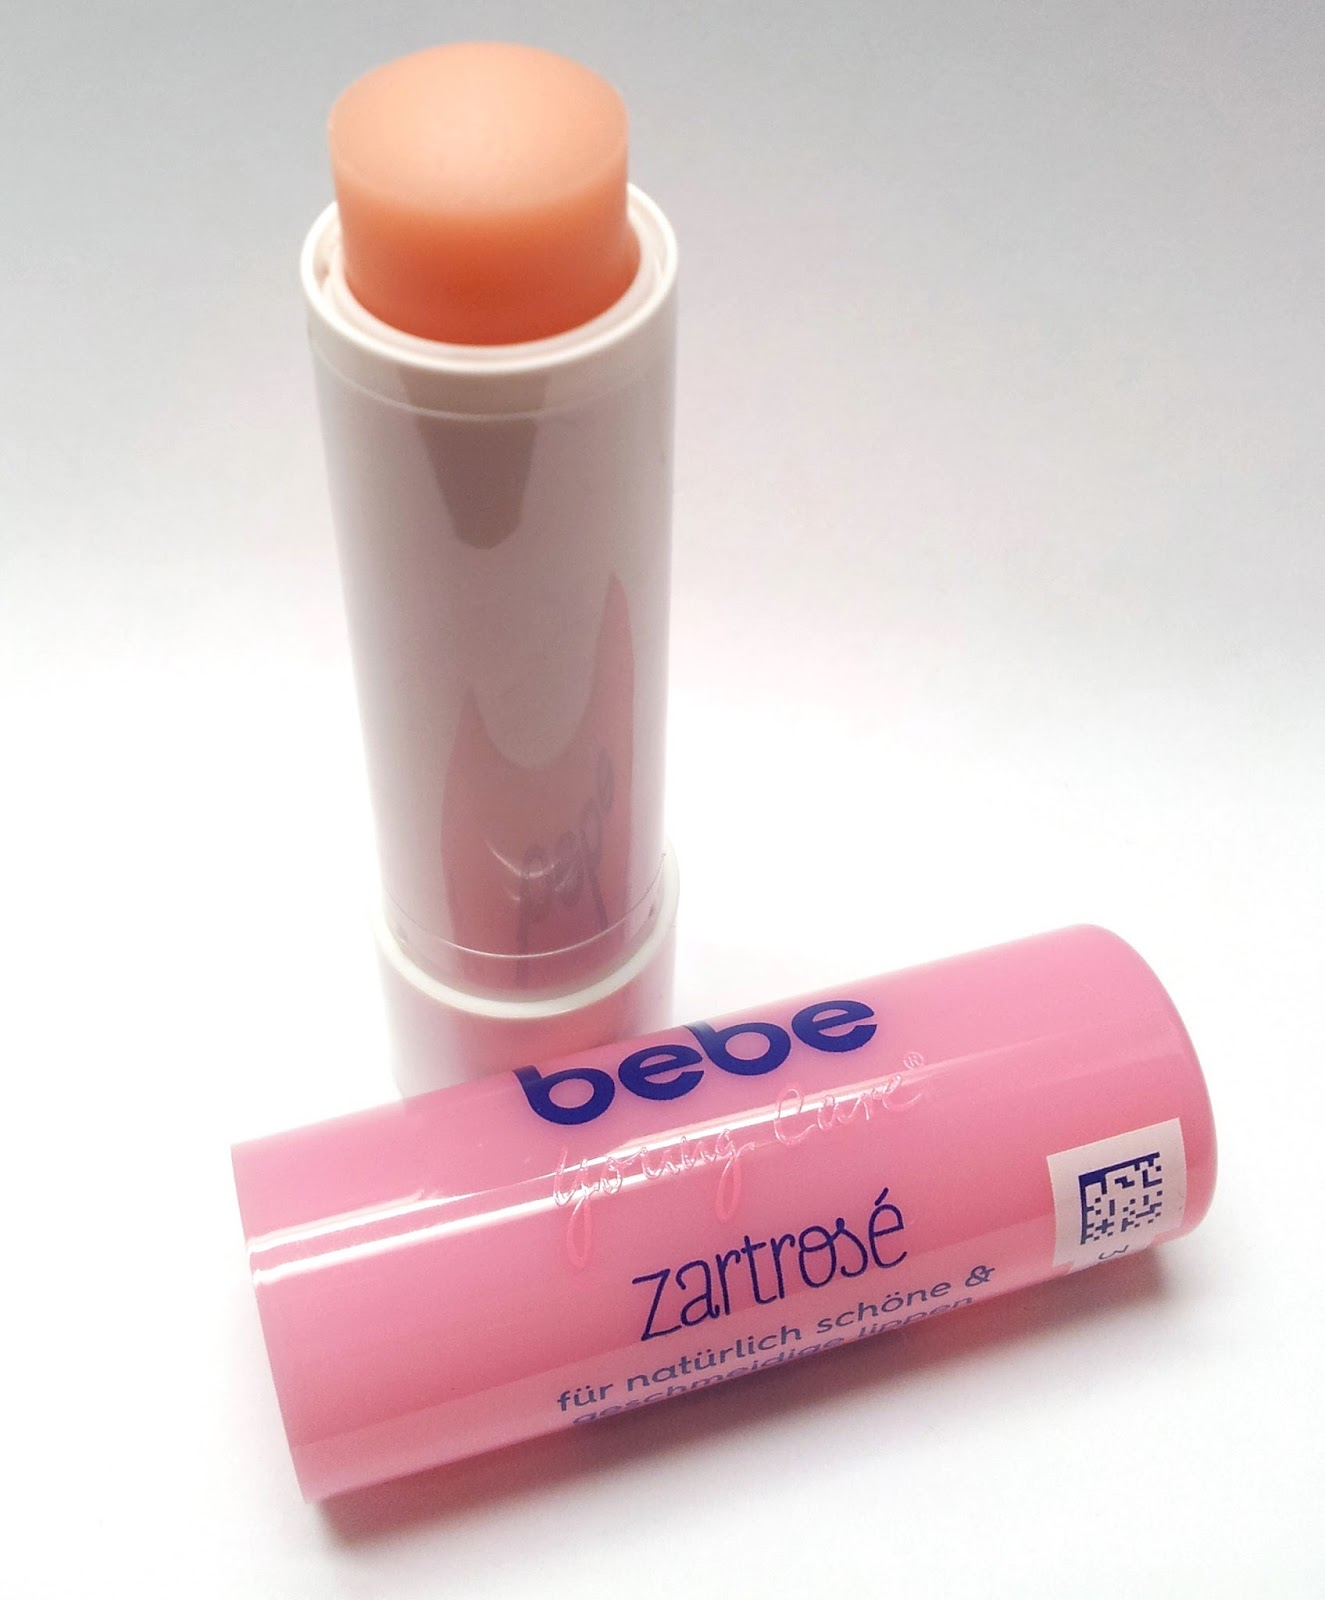 bebe young care Lippenpflege zartrose